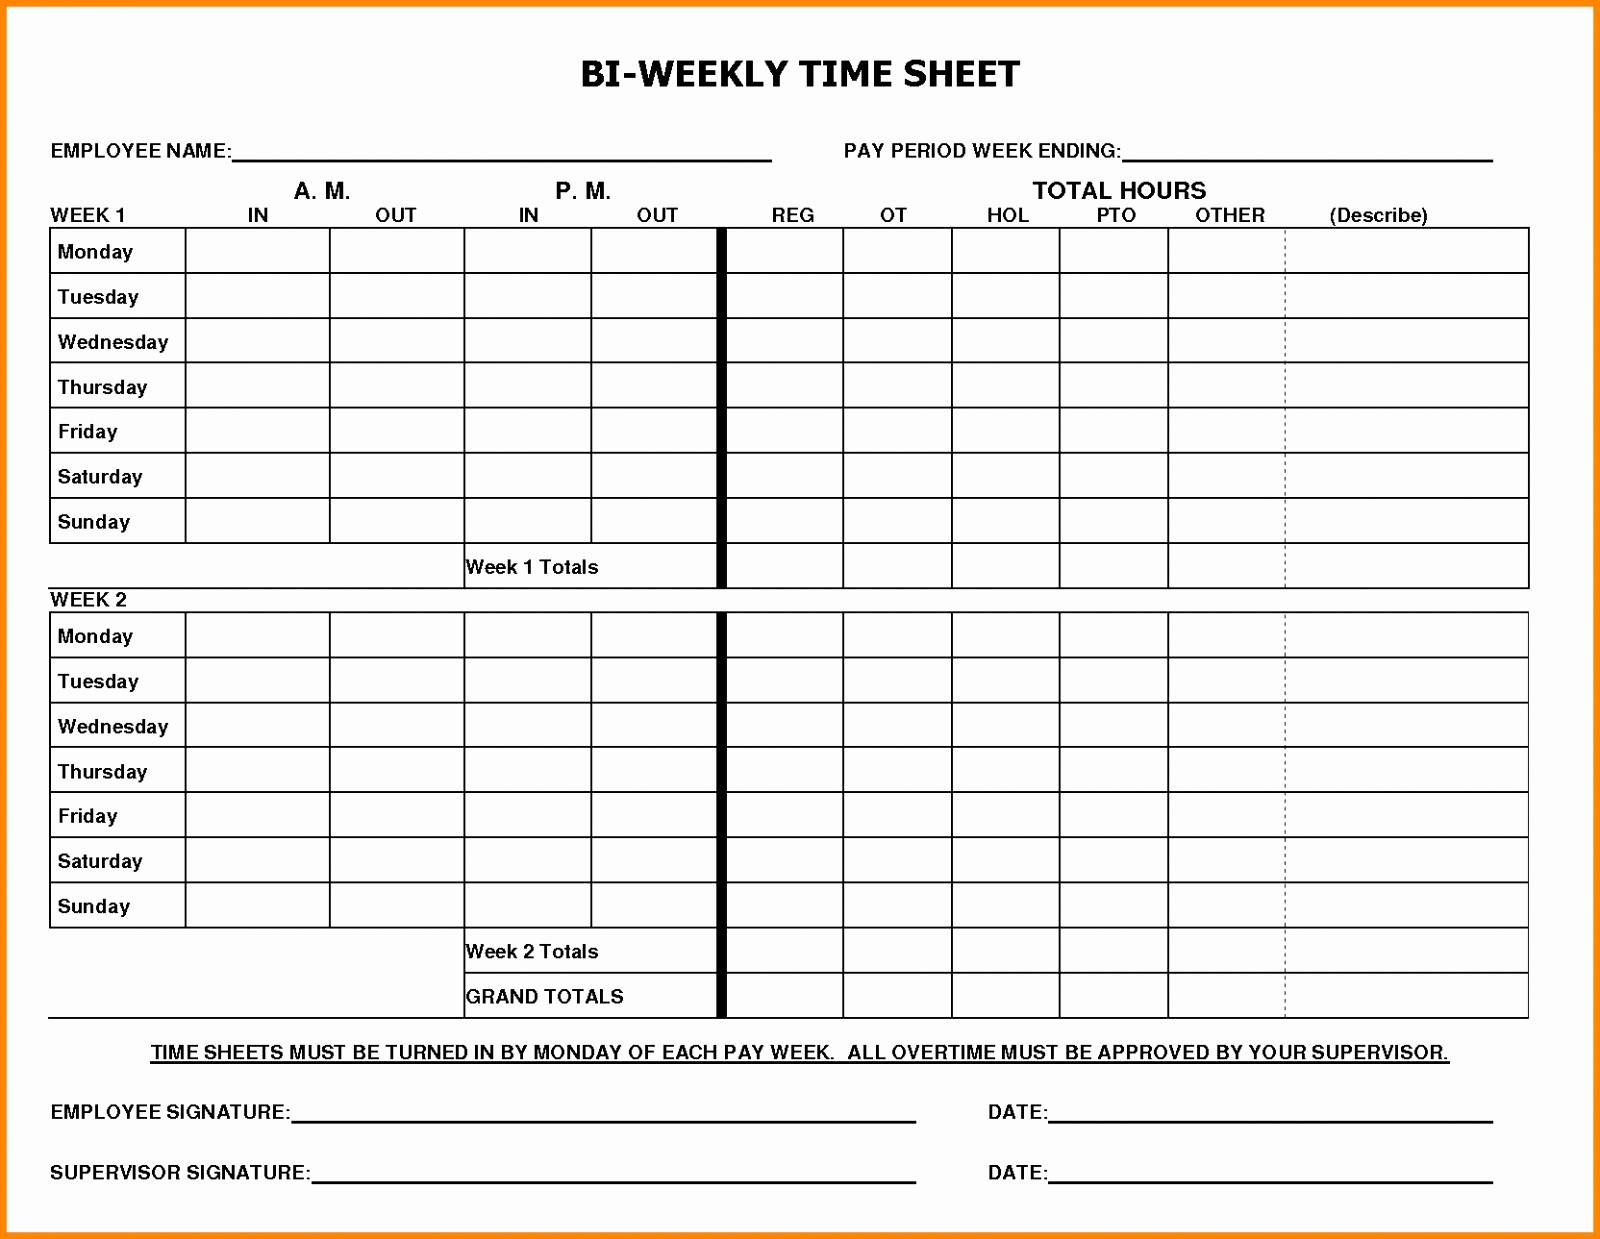 Time Card Calculator Bi Weekly Best Of Free Bi Weekly Time Card Calculator with Lunch Biweekly